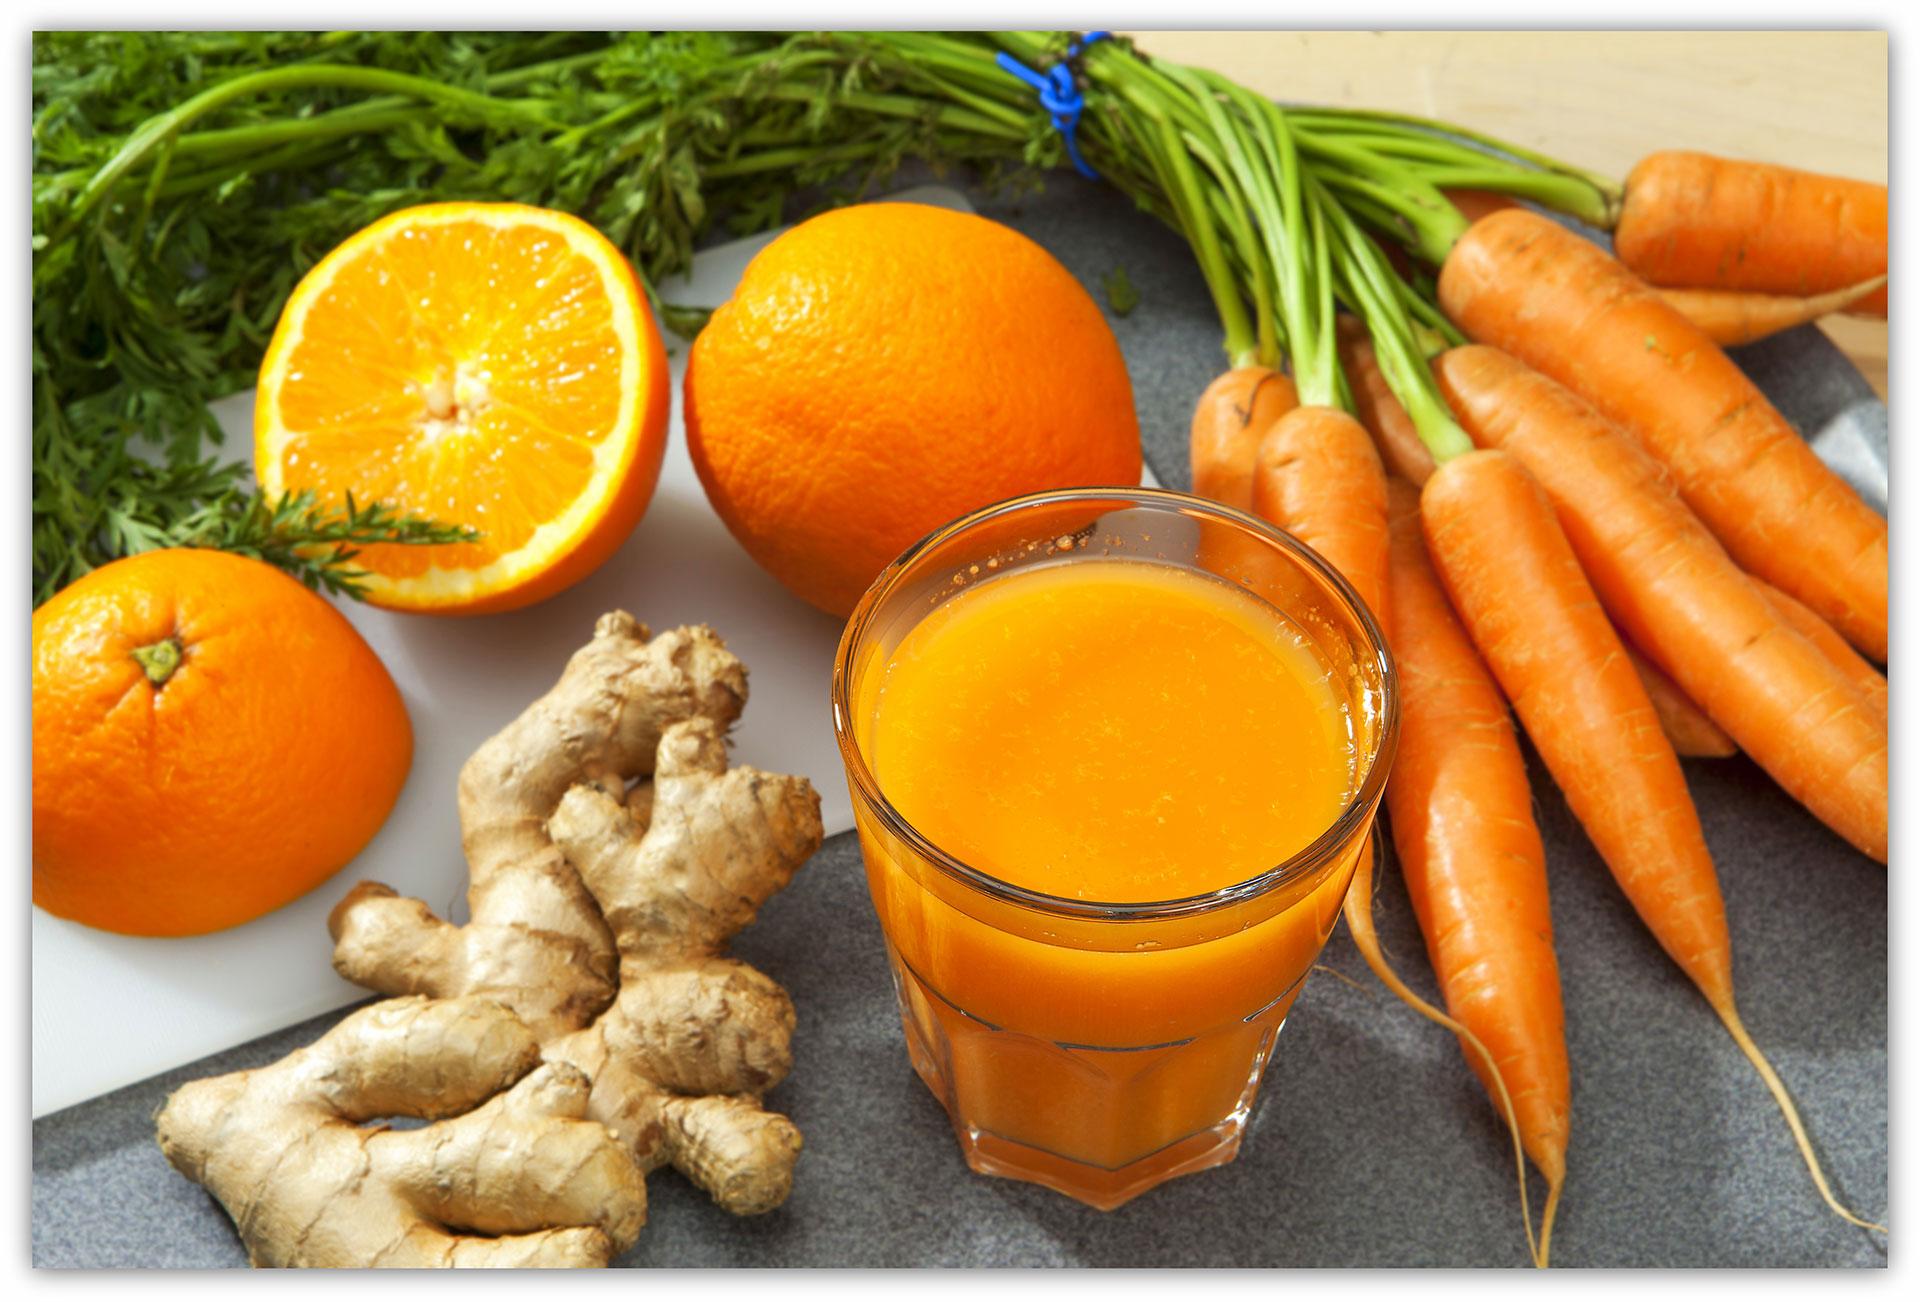 Pomeranč, mrkev, zázvor